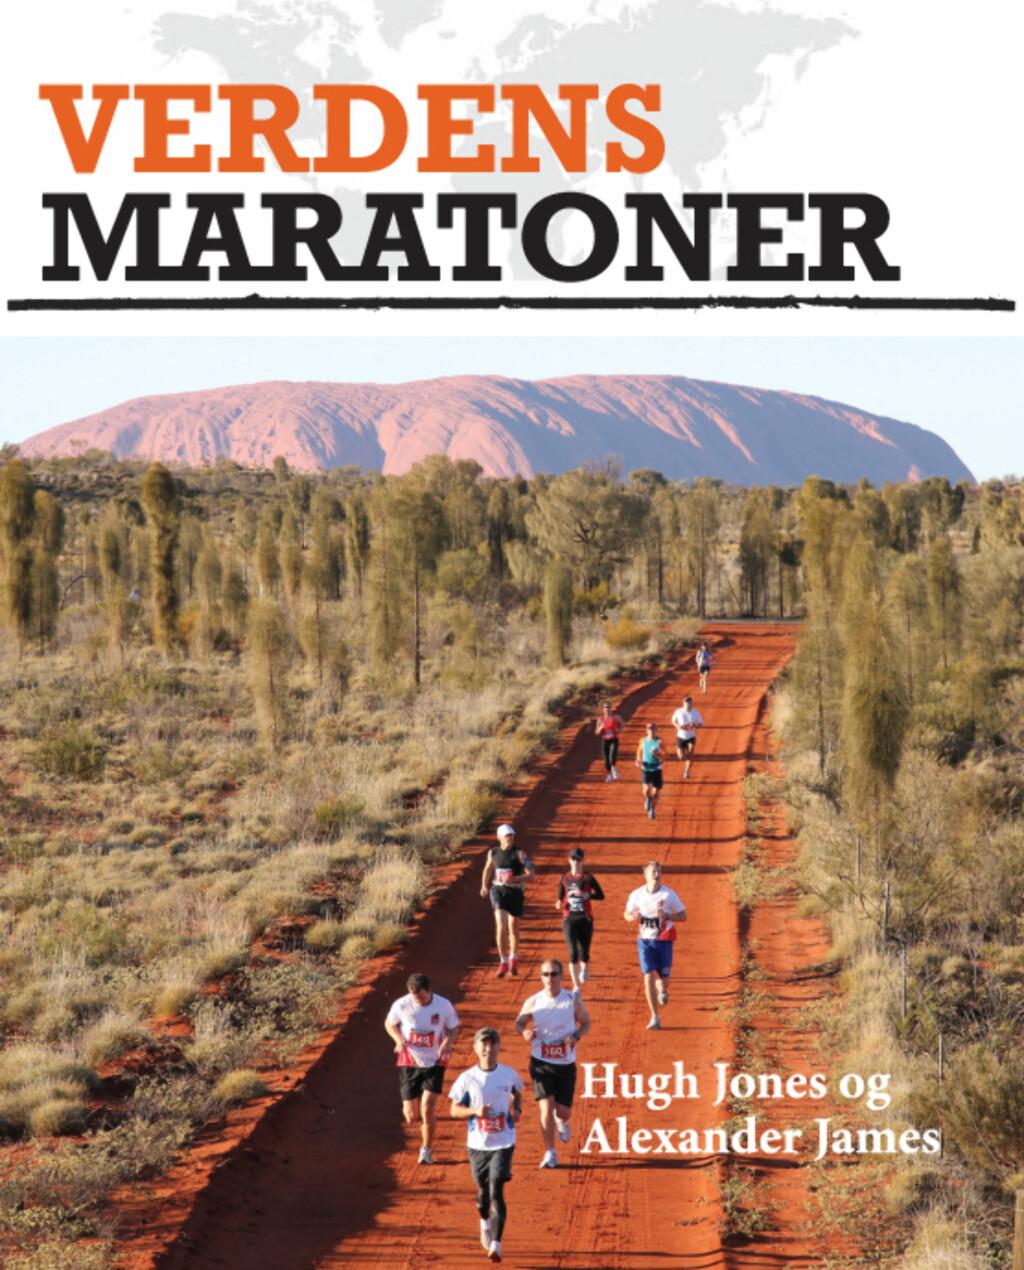 image: Verdens mest ekstreme maraton